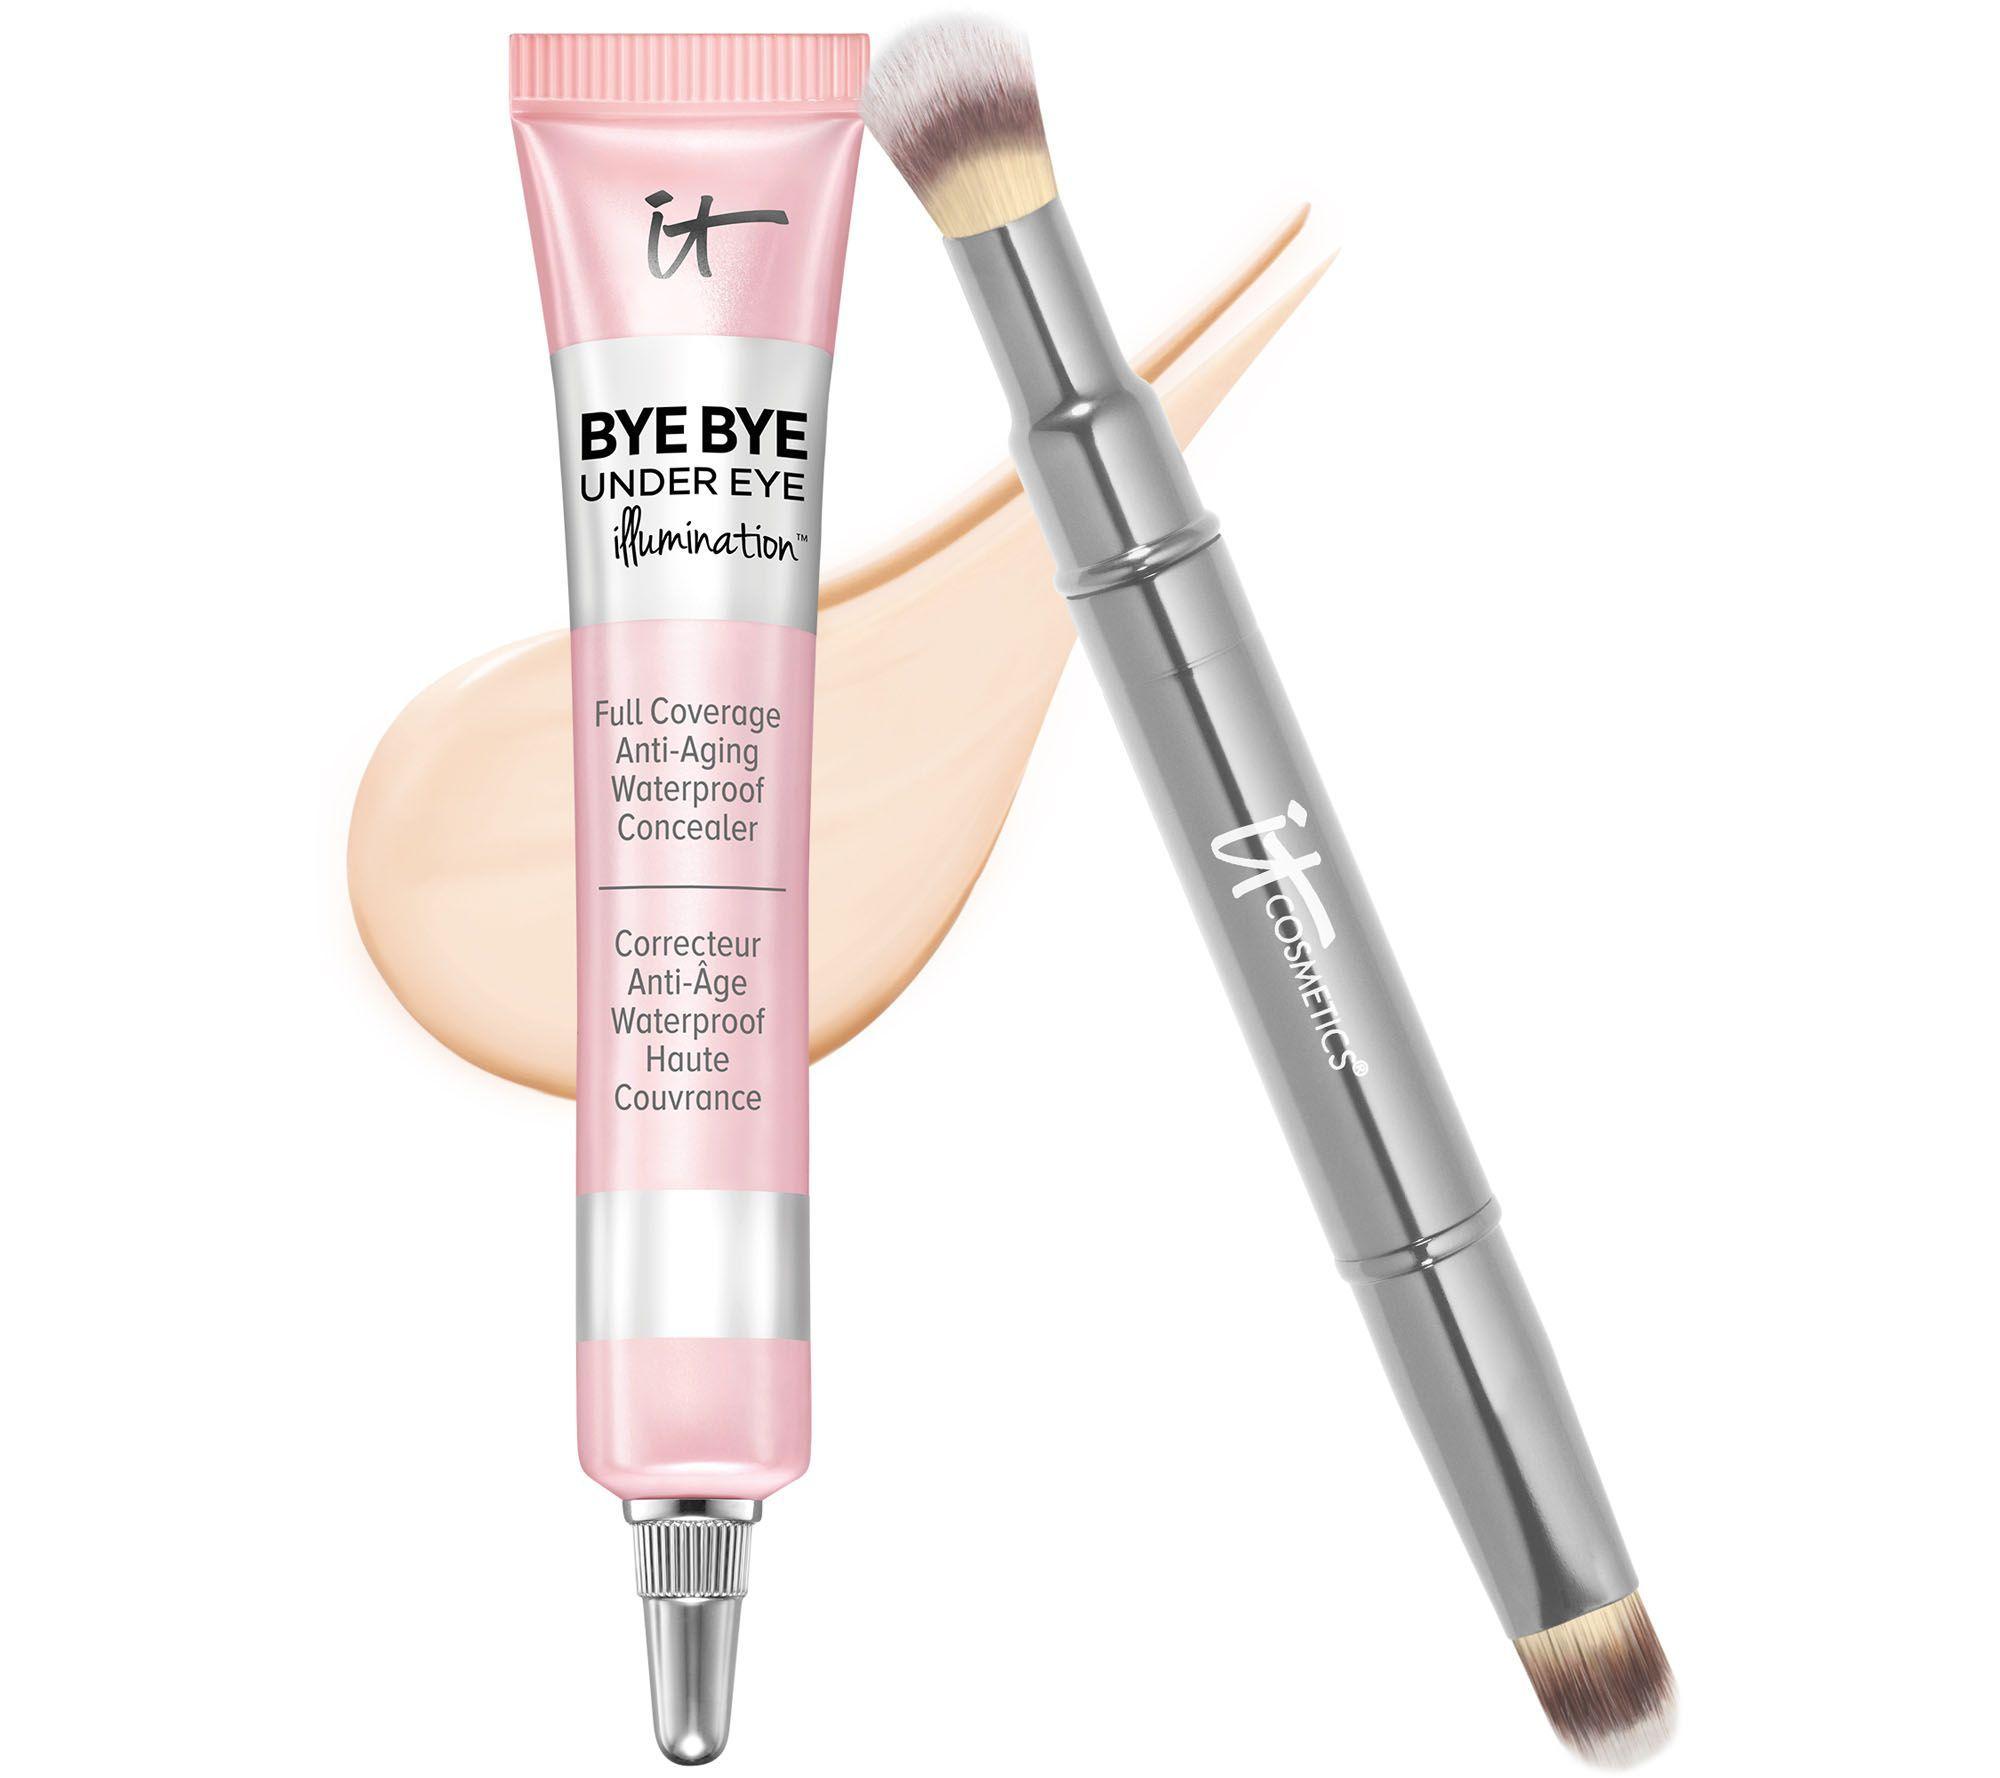 7.31 IT Cosmetics Bye Bye Under Eye Illumination with